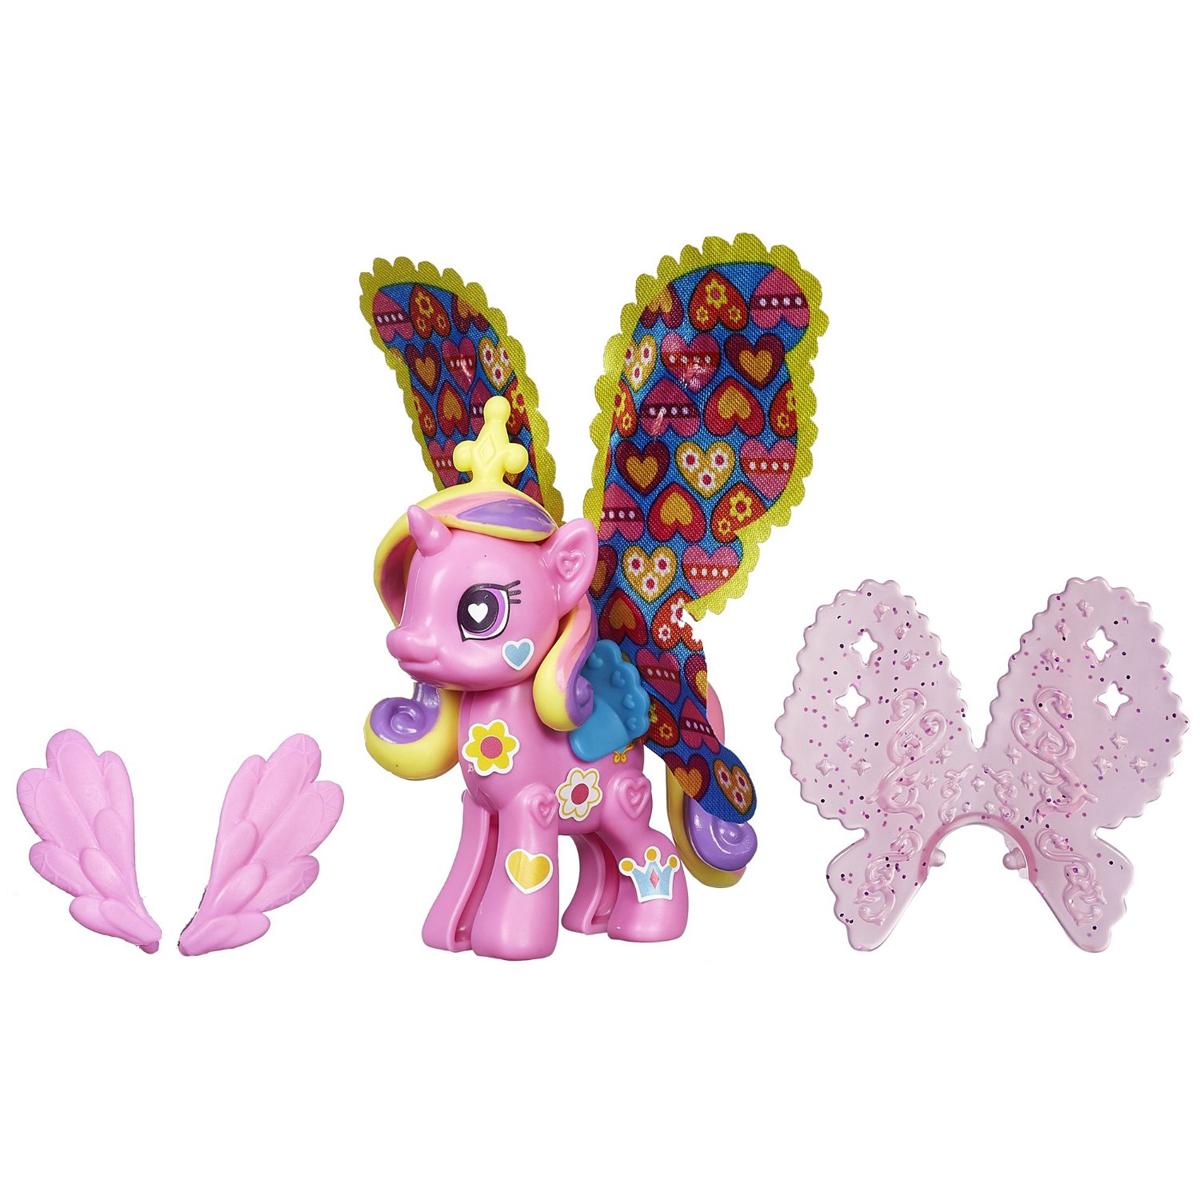 Пони принцесса Каденс с крыльями, My Little PonyМоя маленькая пони (My Little Pony)<br>Пони принцесса Каденс с крыльями, My Little Pony<br>